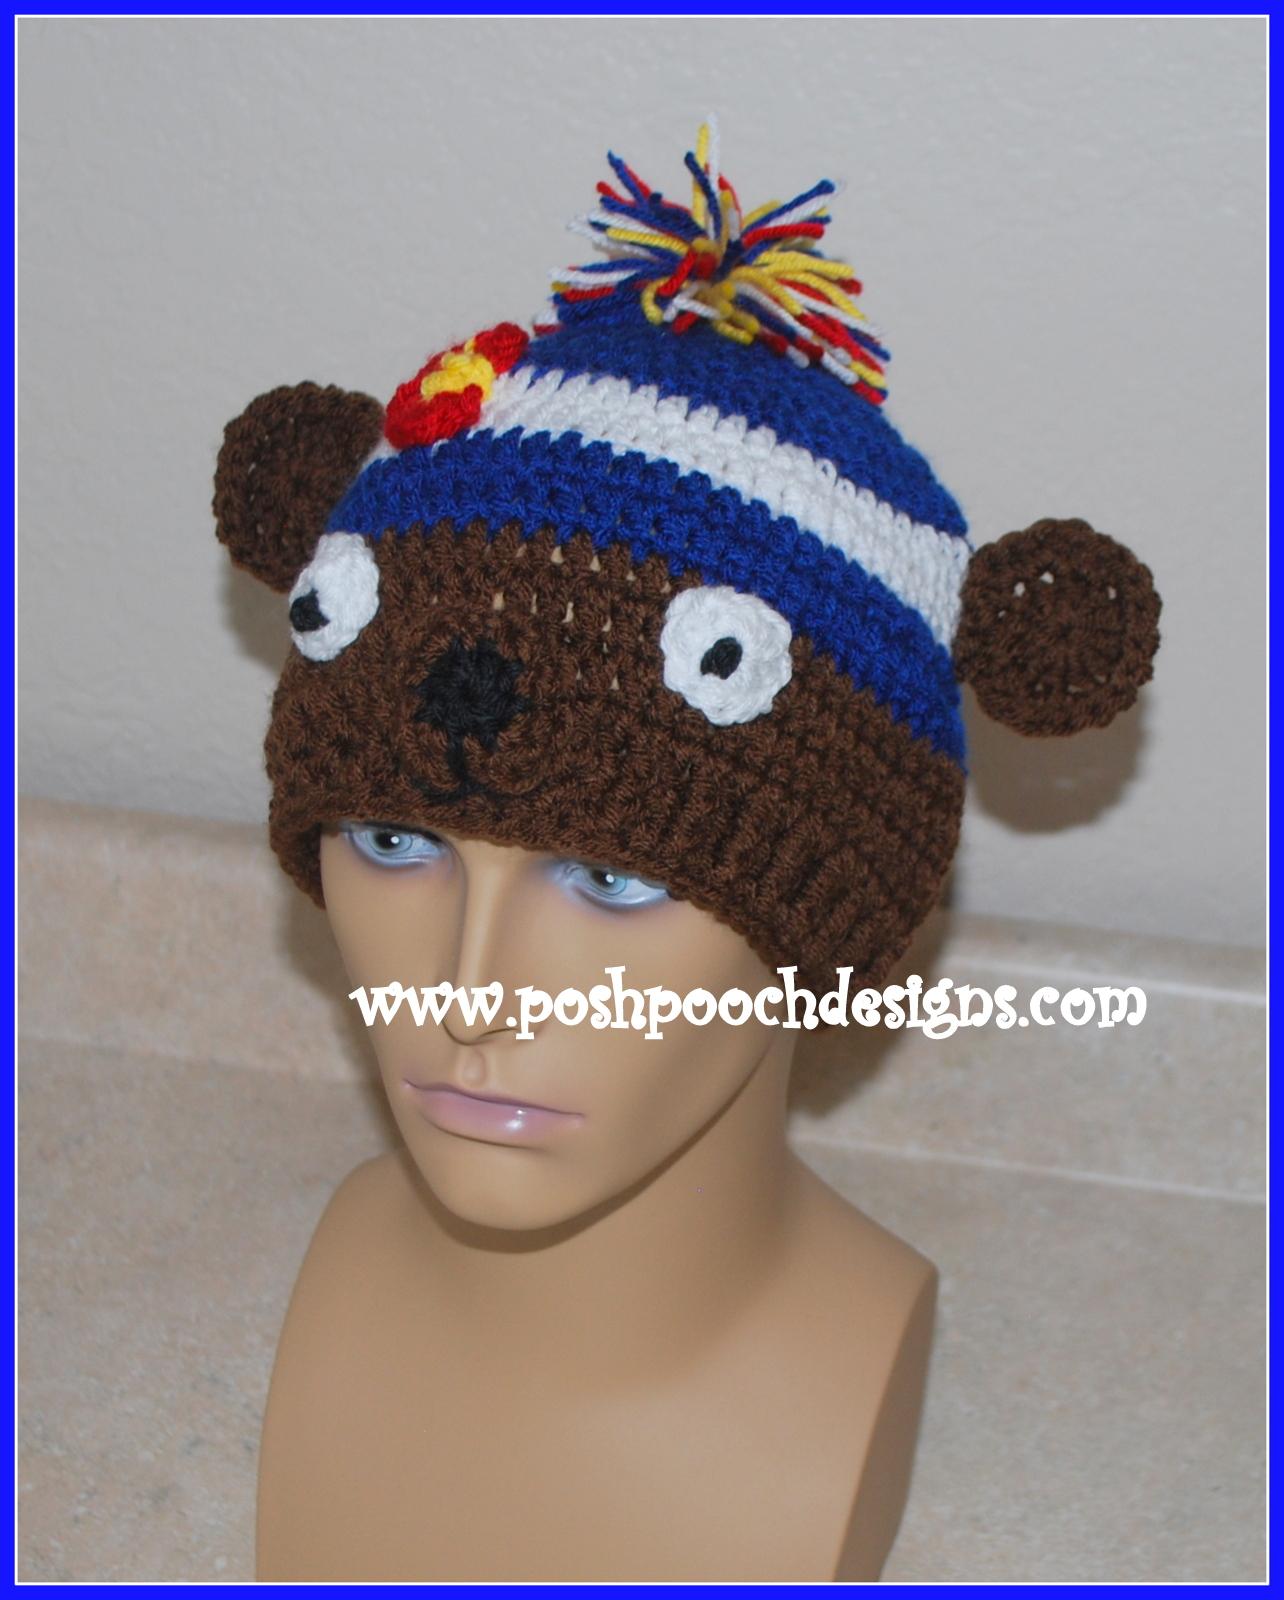 Free Crochet Pattern Dog Beanie : Posh Pooch Designs Dog Clothes: Bear Colorado Beanie Hat ...